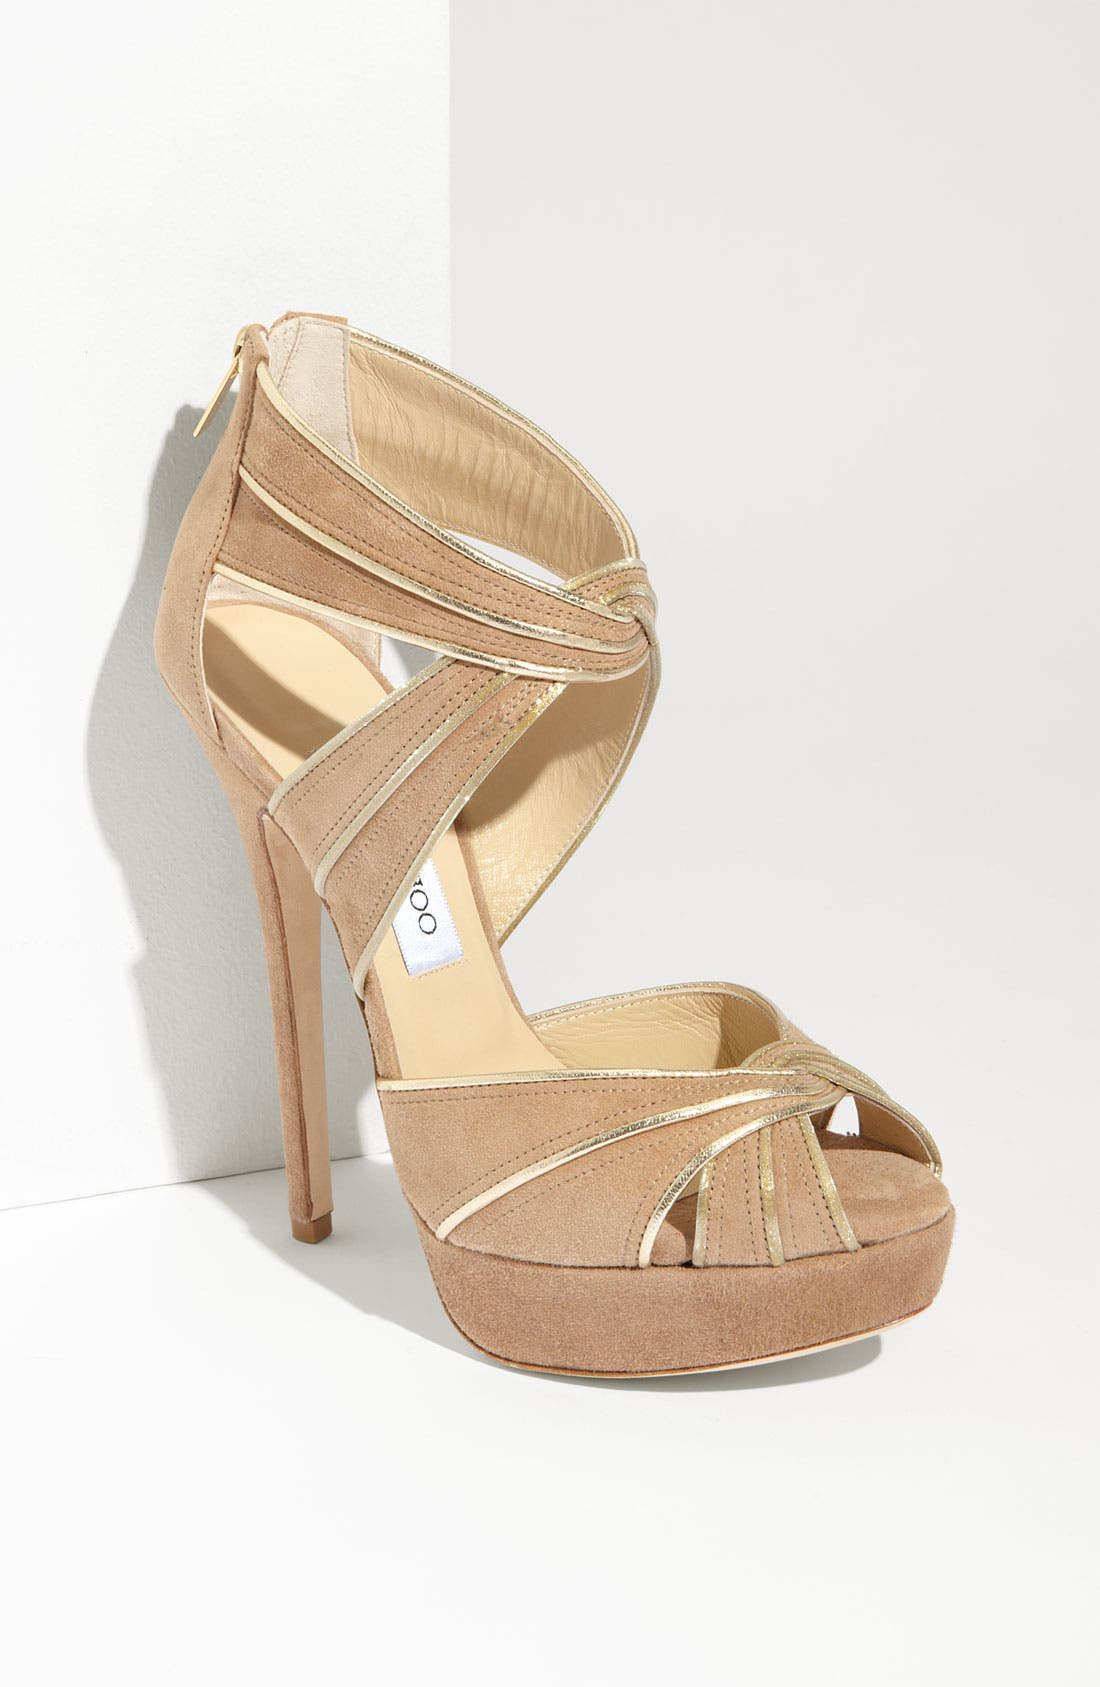 Main Image - Jimmy Choo 'Koko' Piped Platform Sandal